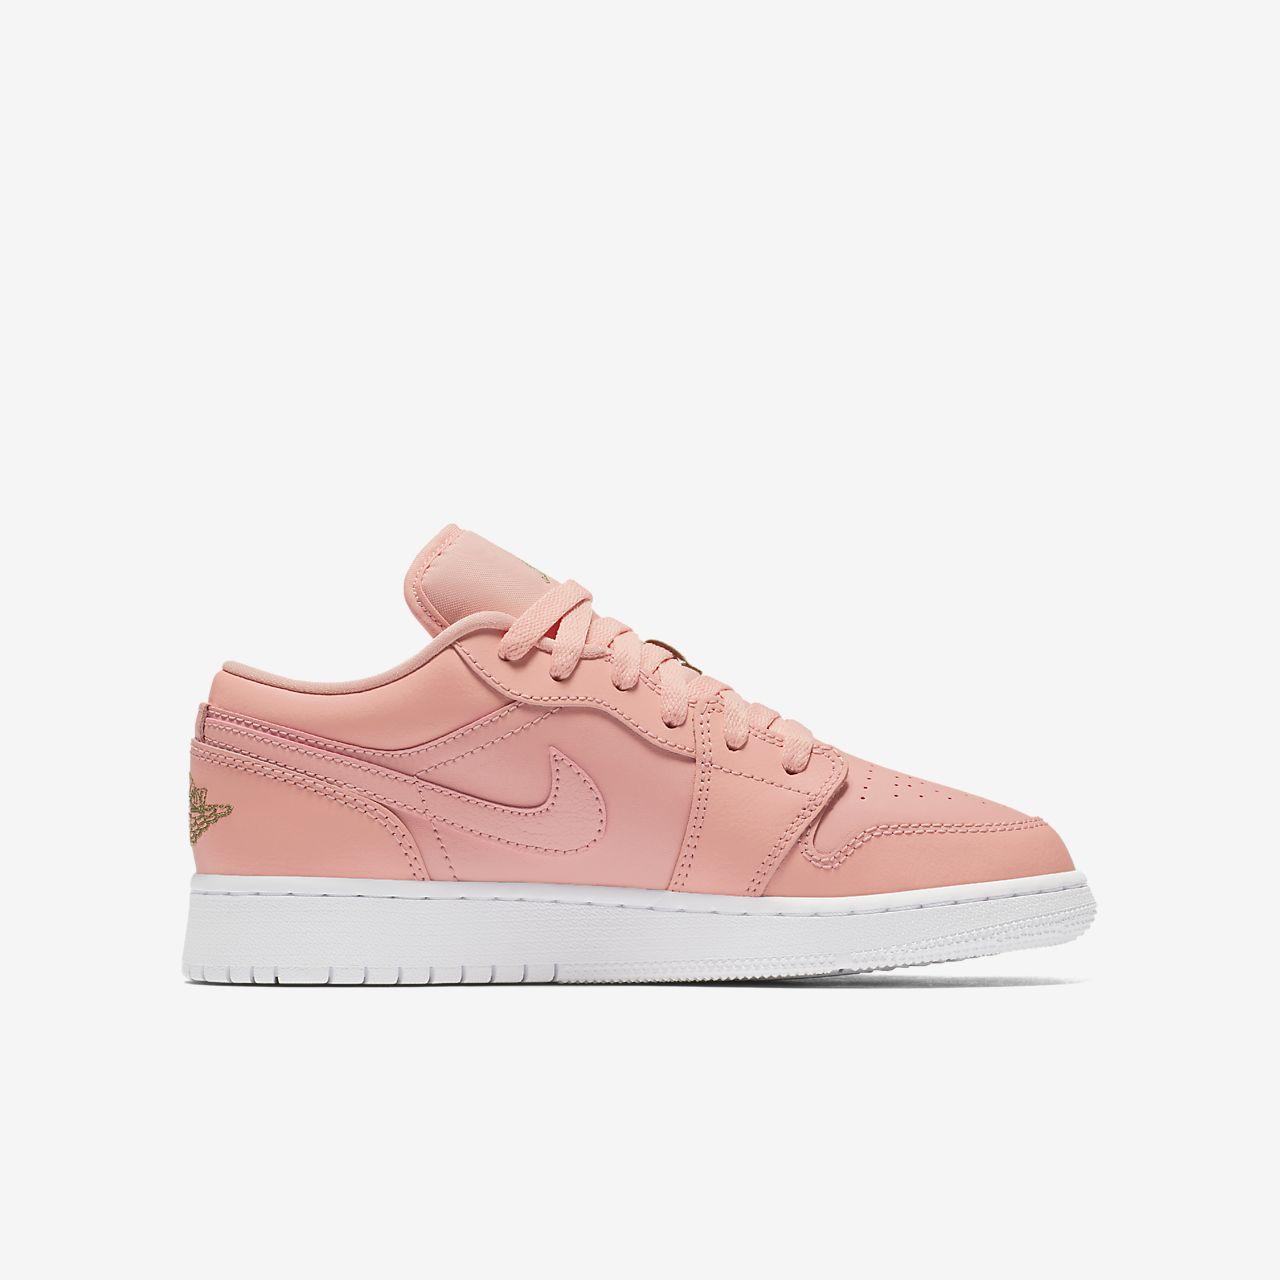 new style 627d6 71510 Air Jordan 1 Low Big Kids (Girls) Shoe ...